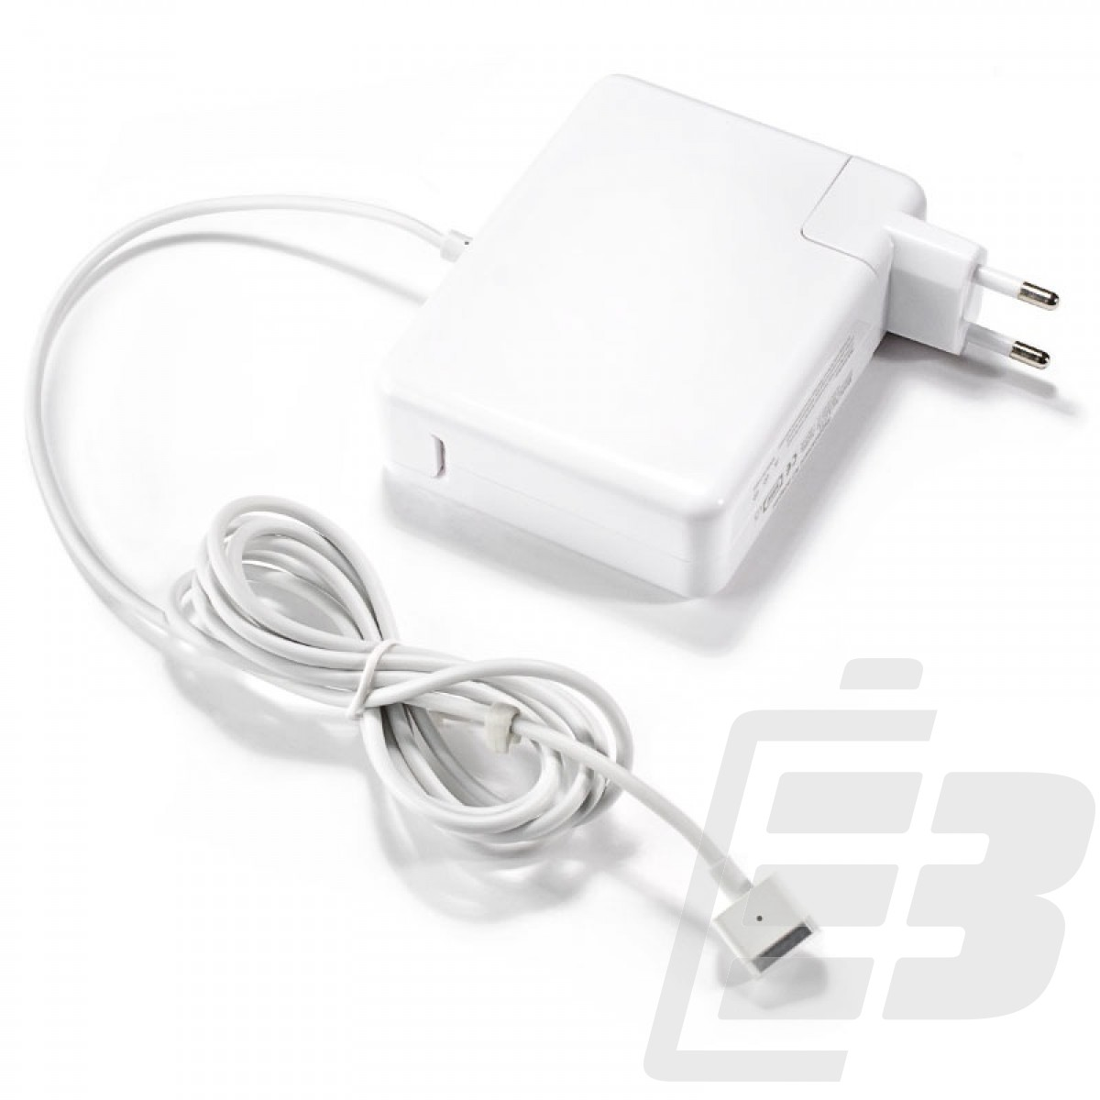 Laptop Adapter for Apple 18,5V 85W MagSafe_1